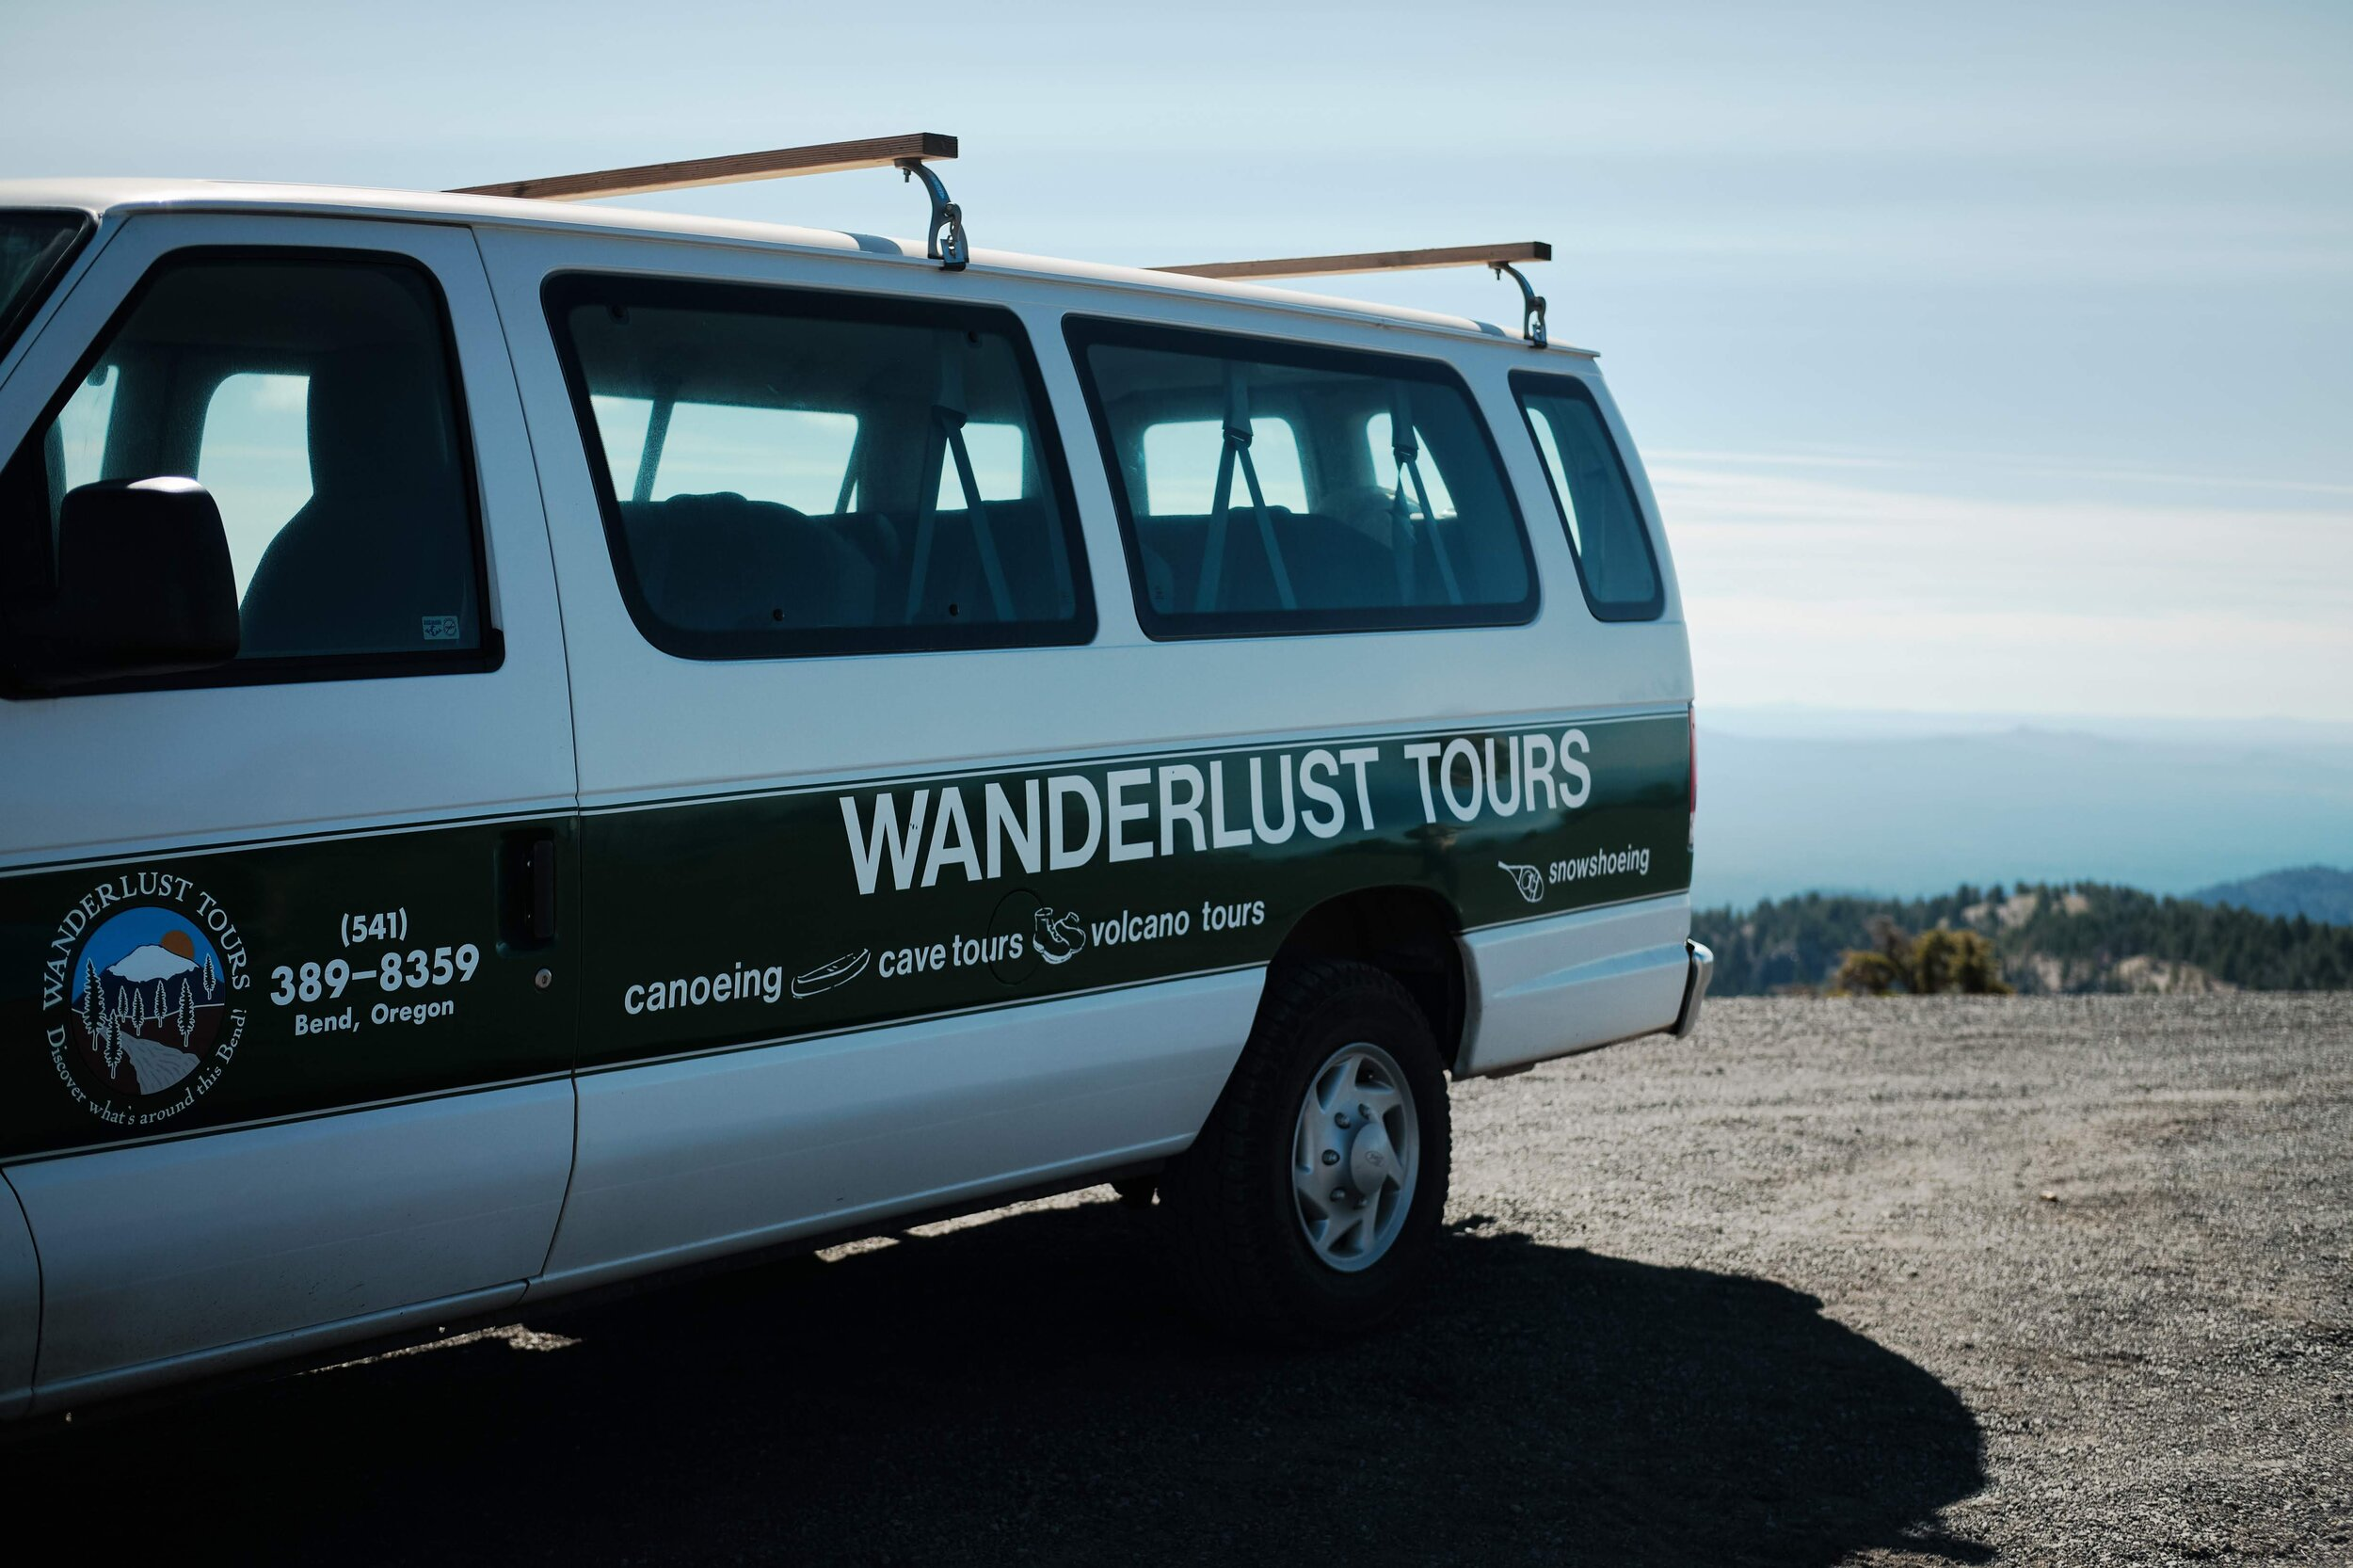 Wanderlust Tours - Bend Oregon - Our Van